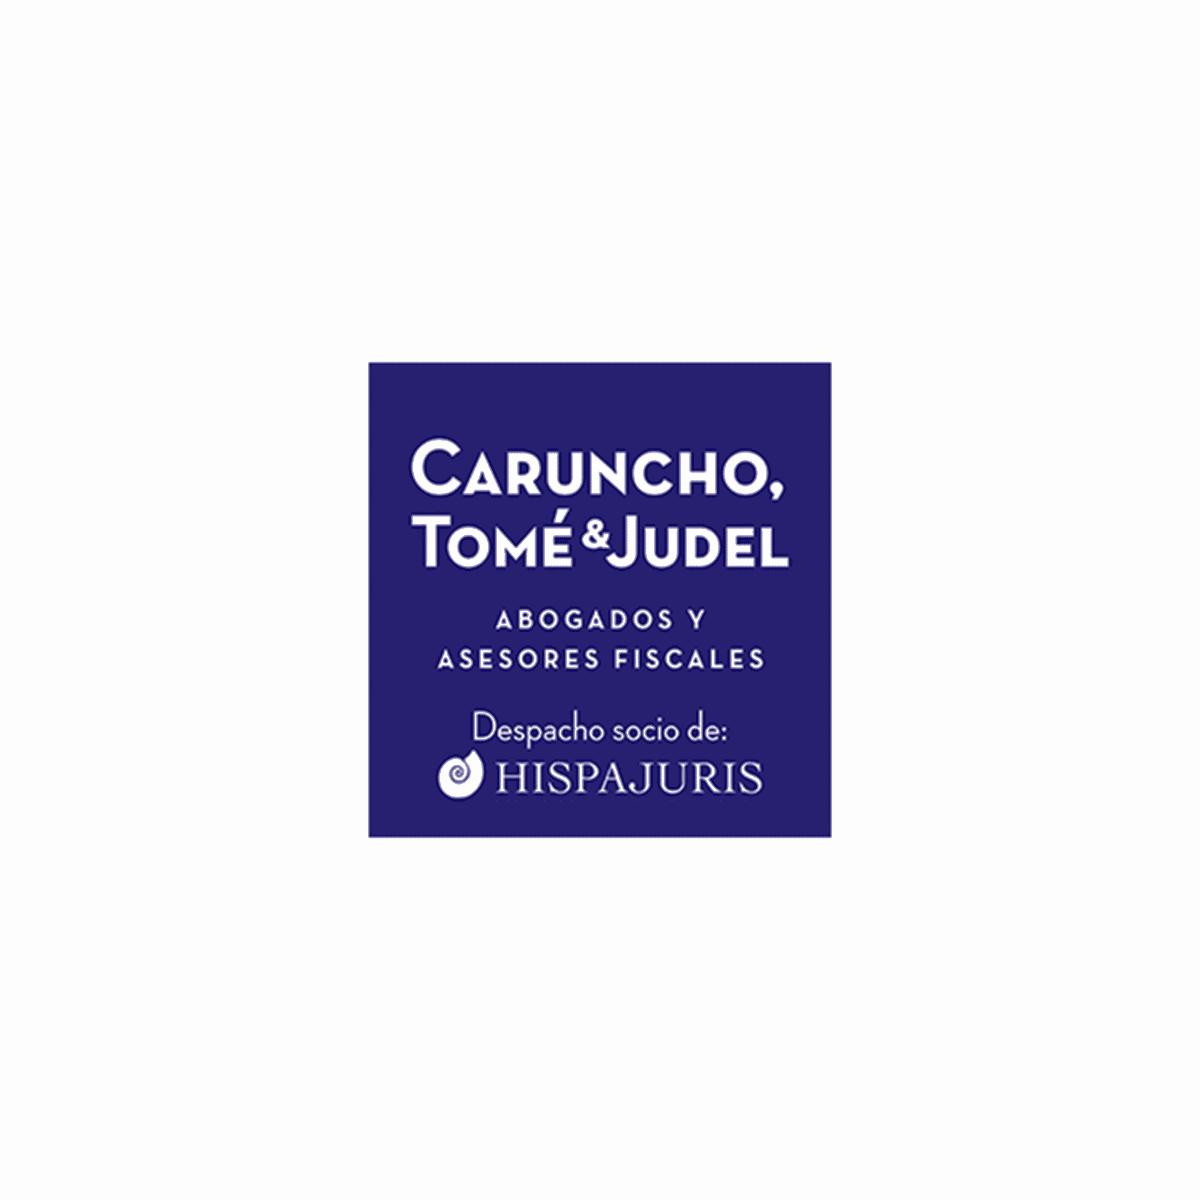 logo caruncho tome judel